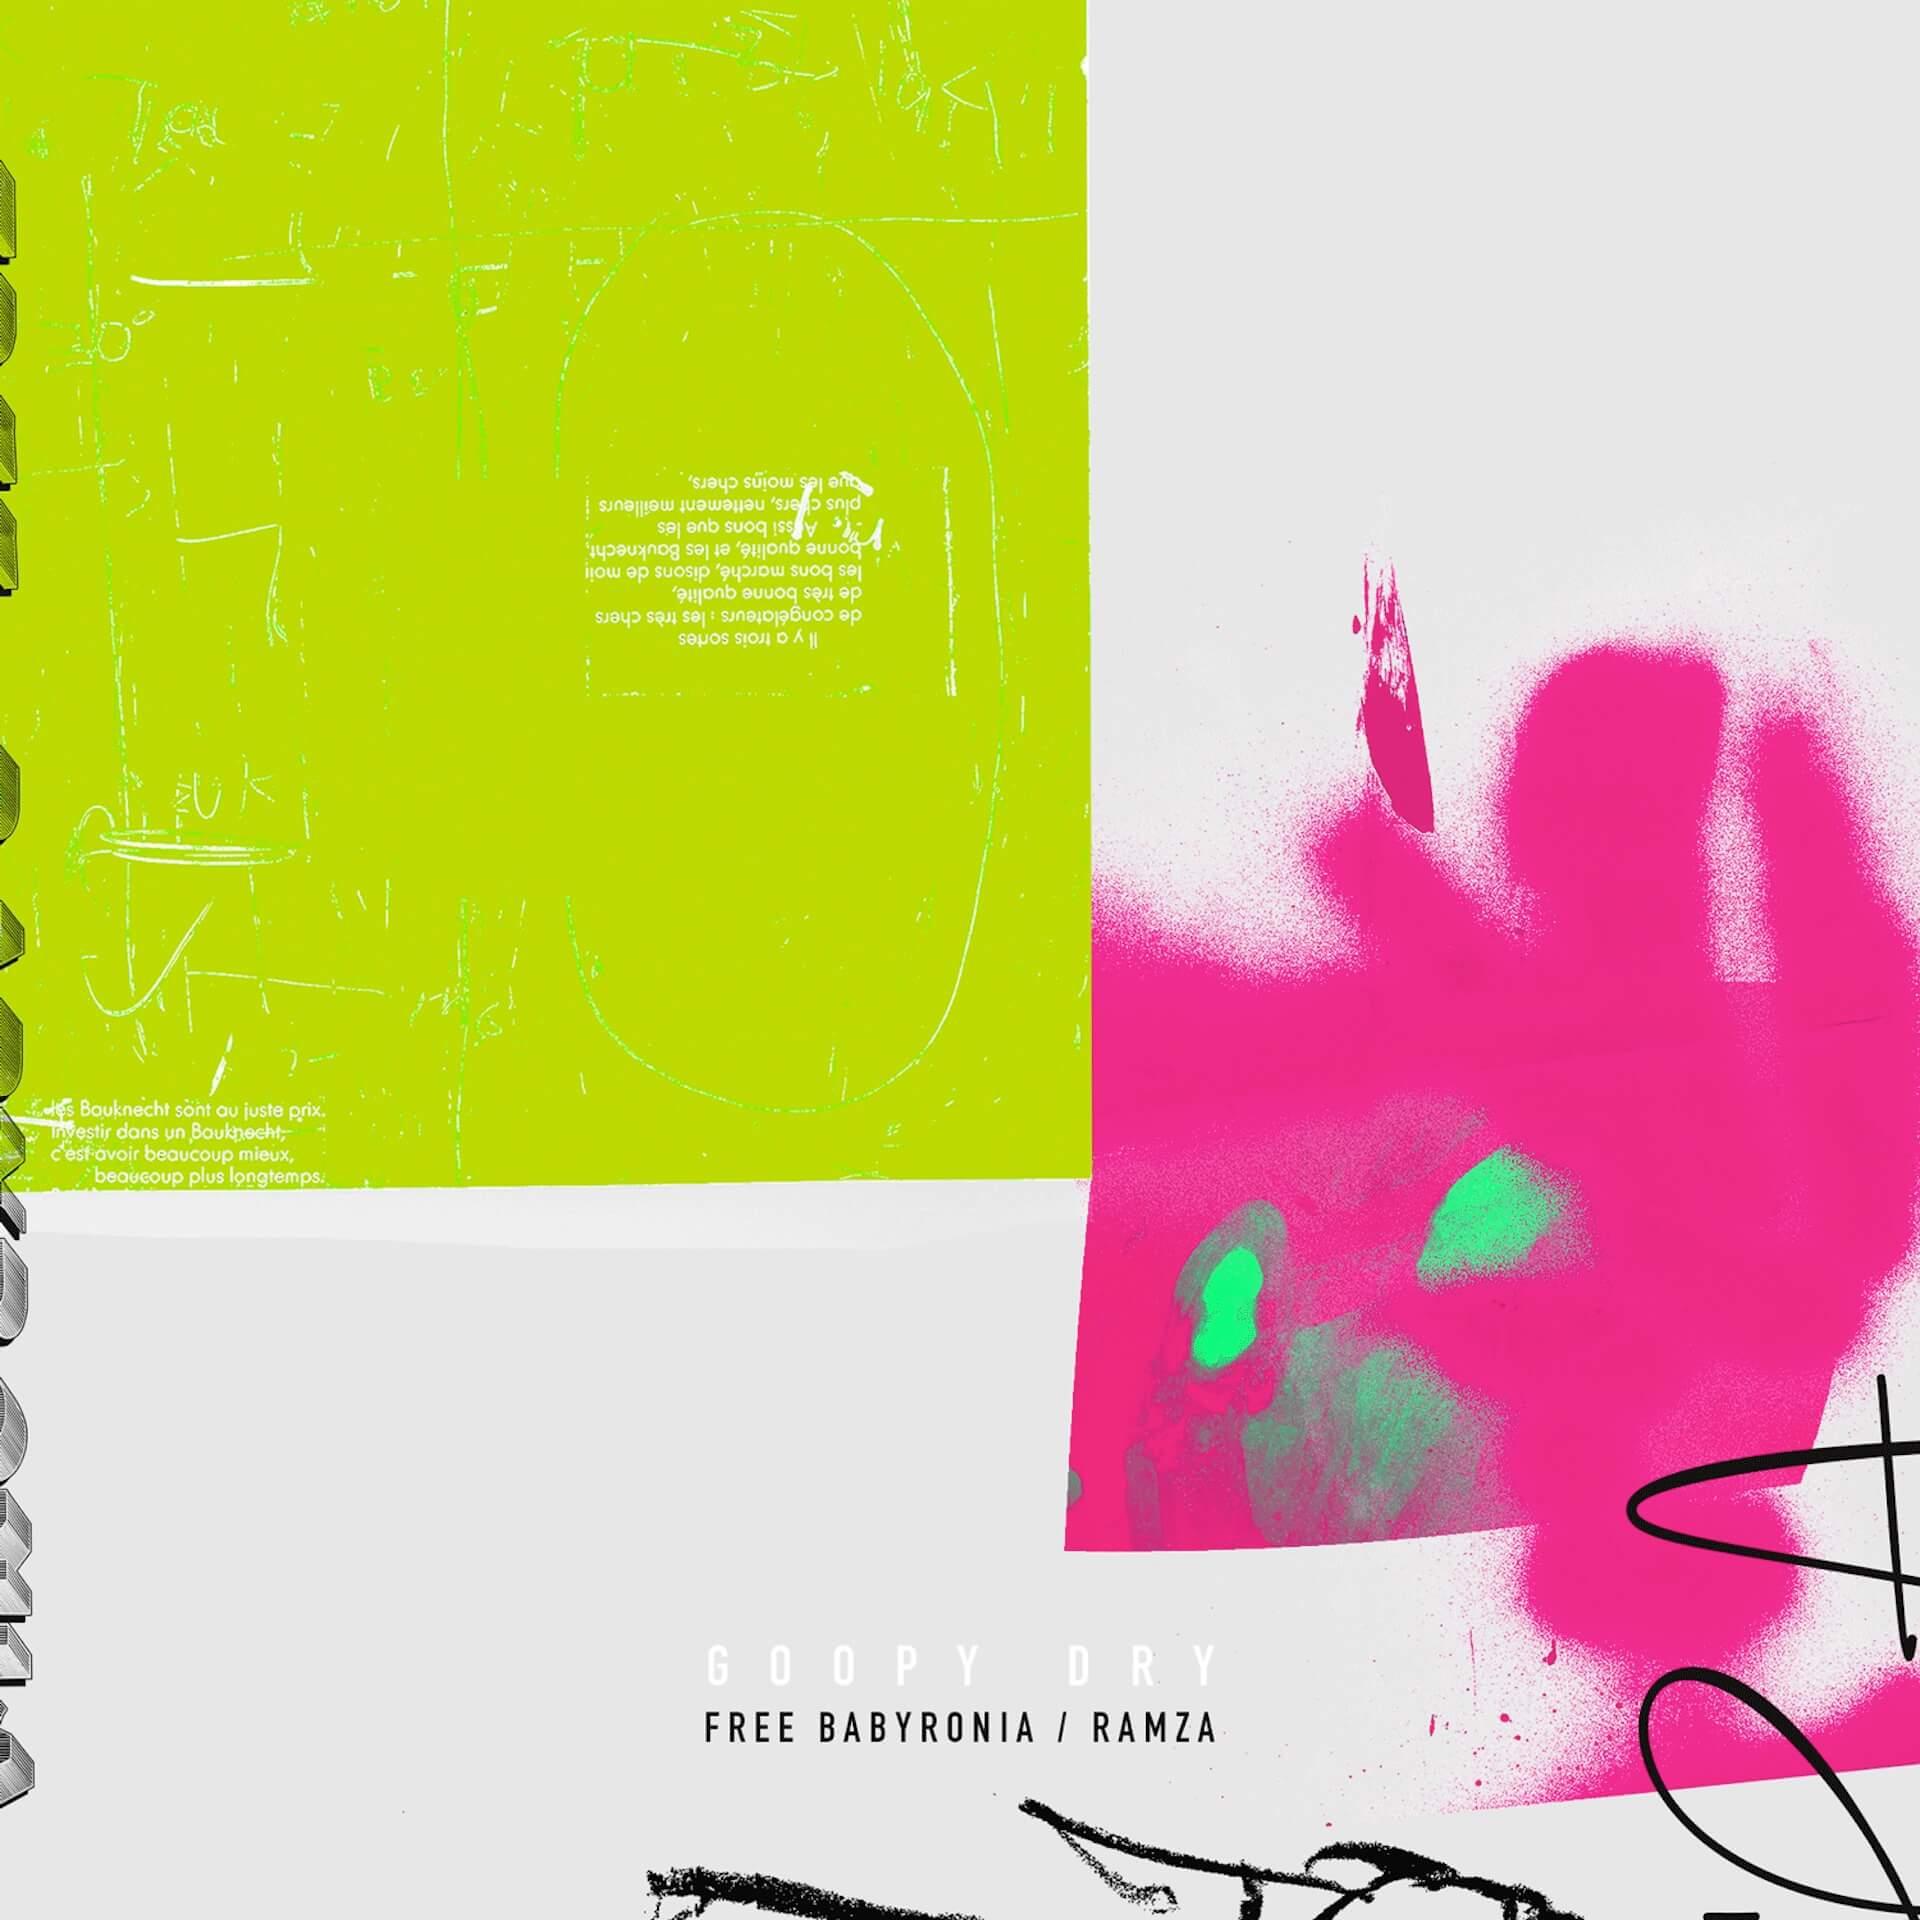 Campanellaの盟友Free BabyroniaとRamzaによるsplit EP『GOOPY DRY』が〈AUN Mute〉よりリリース GOOPY-DRY